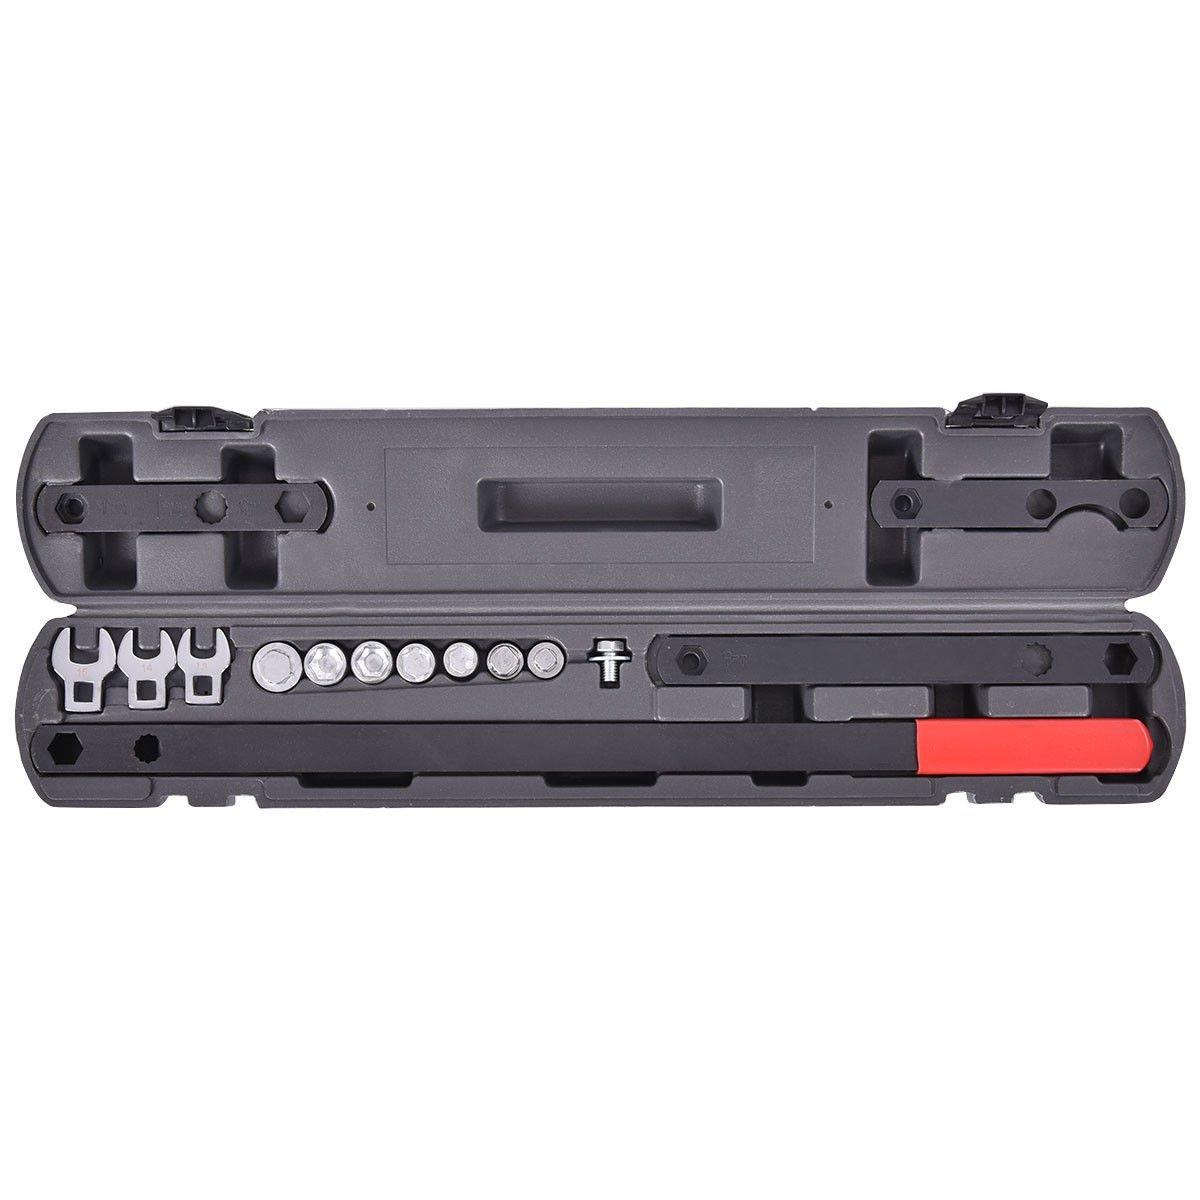 Goplus 16PC Wrench Serpentine Belt Tool Set Adjuster Tightener Wrench Tool Universal 3/8'' 1/2'' Drive